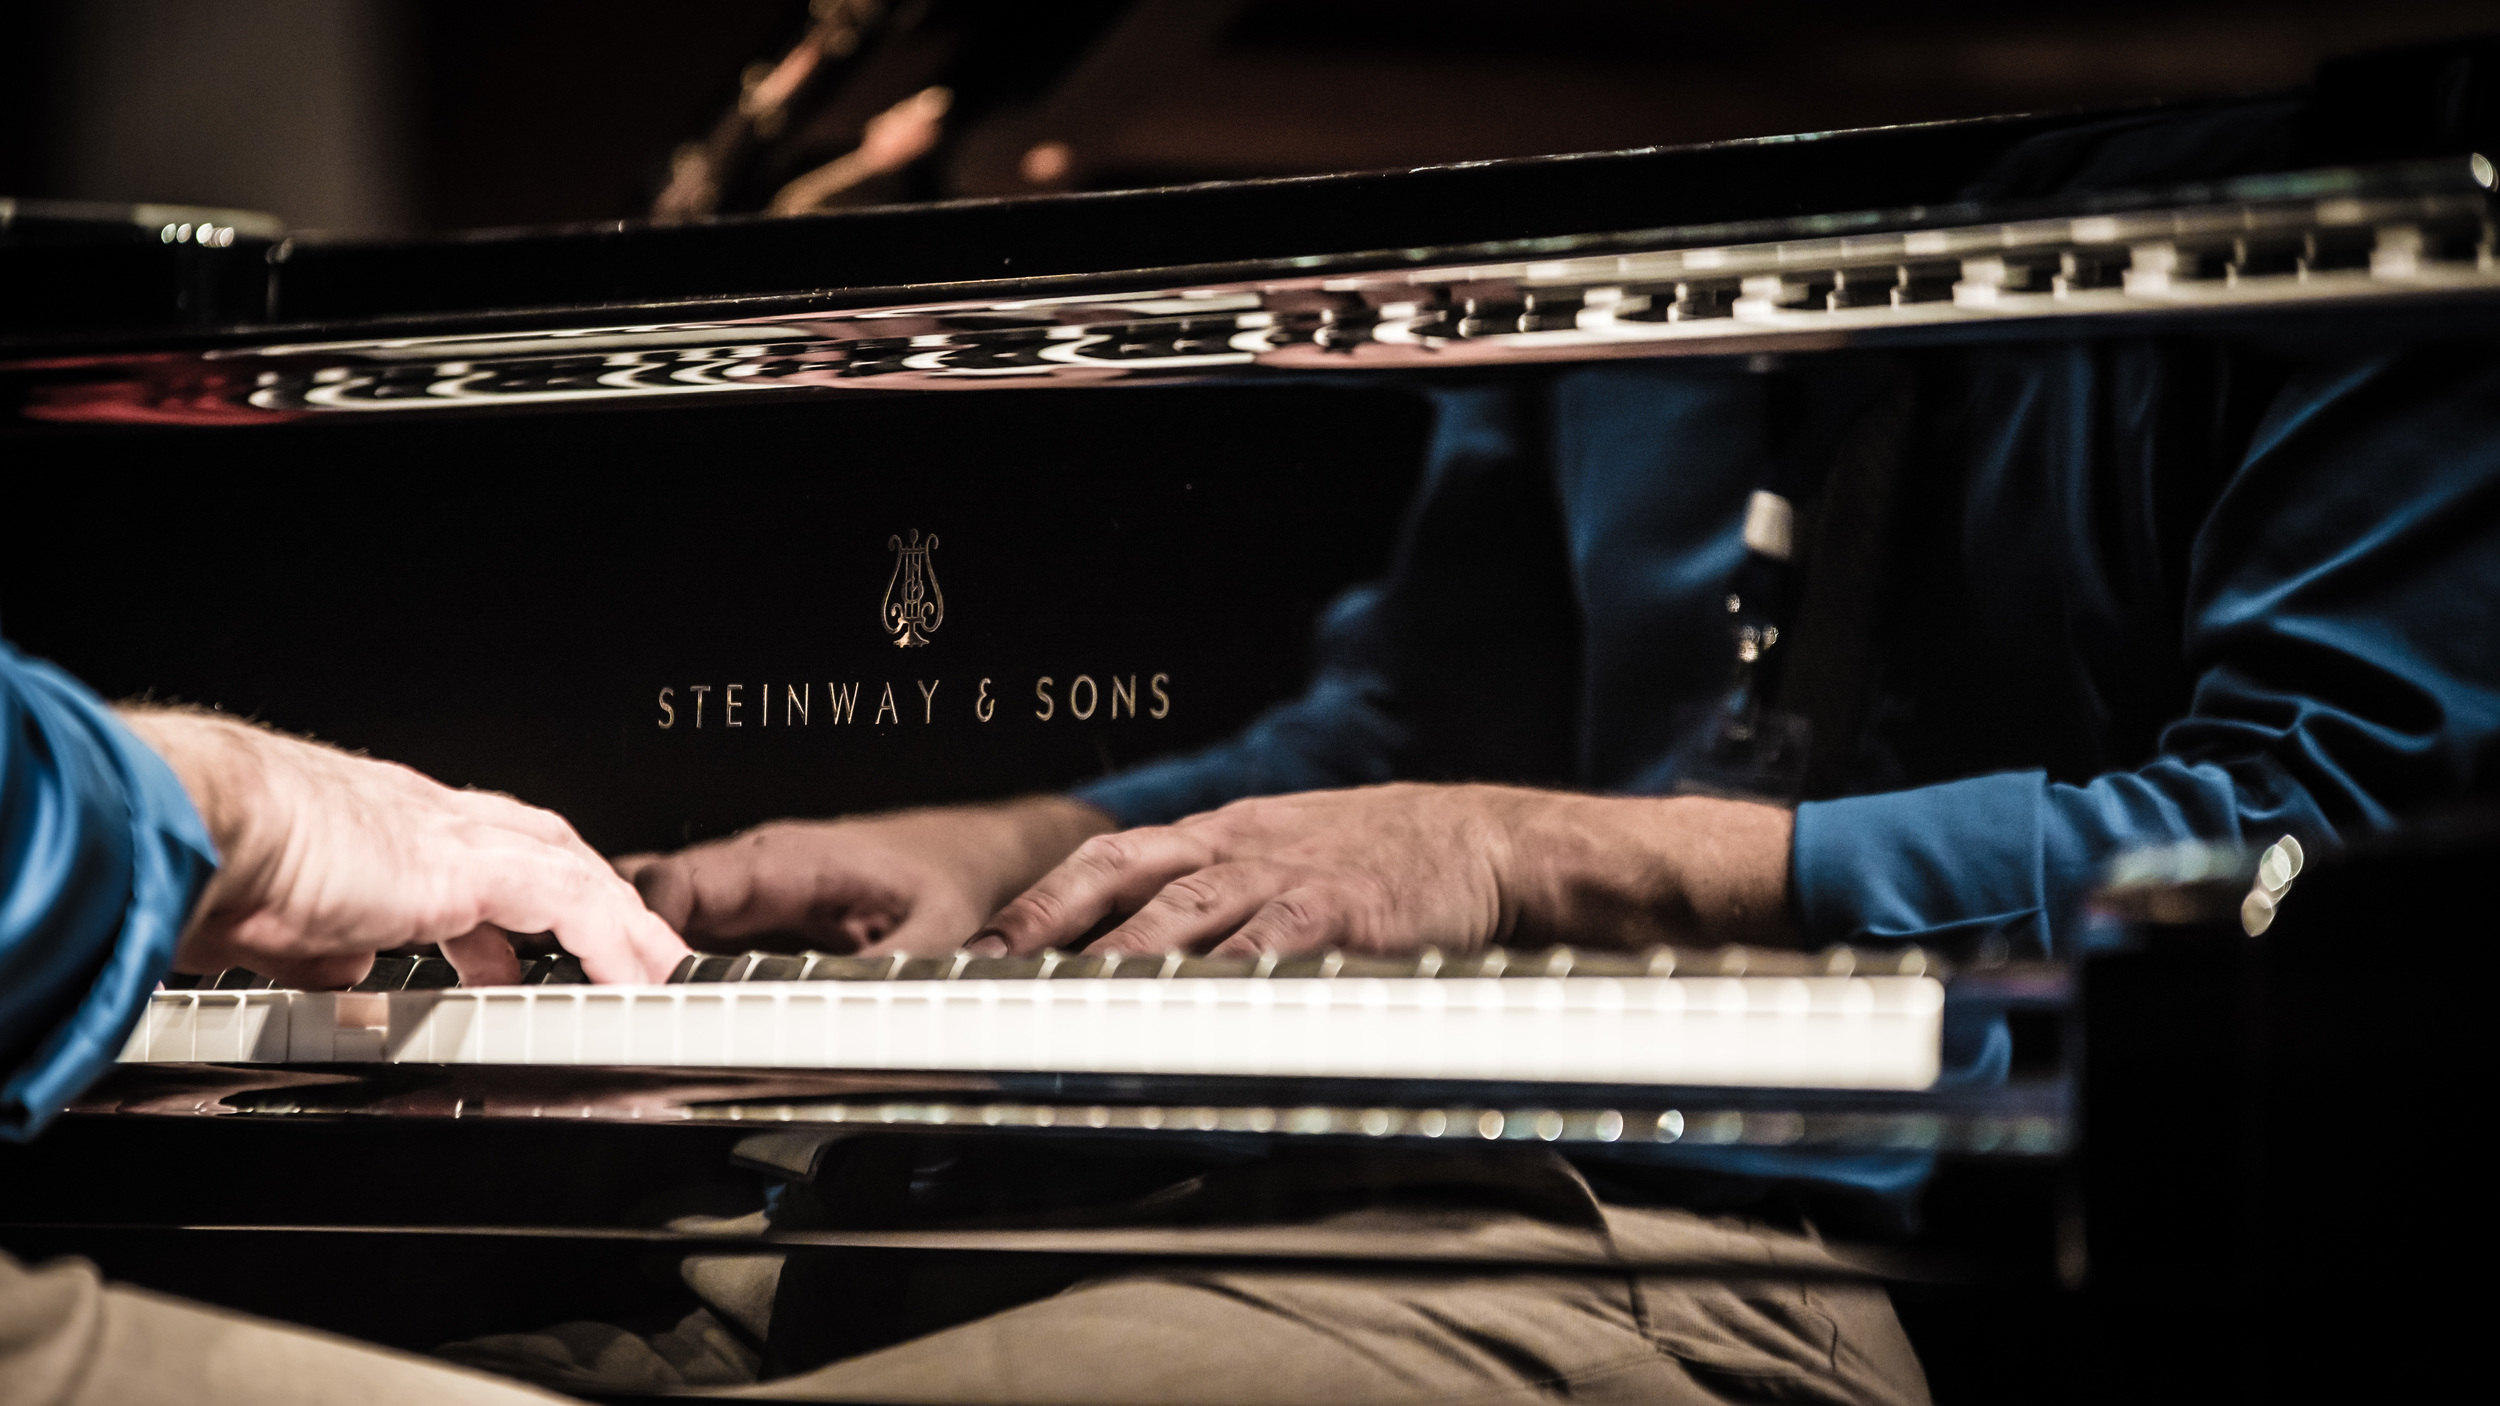 stefan-karlsson-piano.jpg